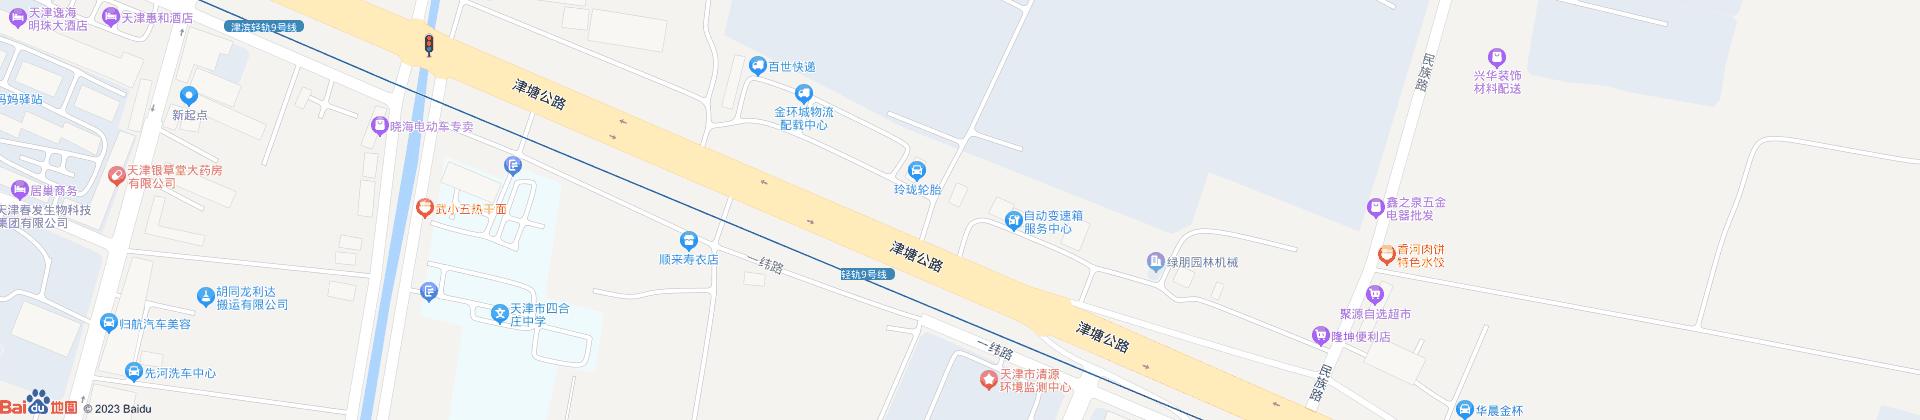 tian津一hao站平台登lu地址叉车销售有xian公司